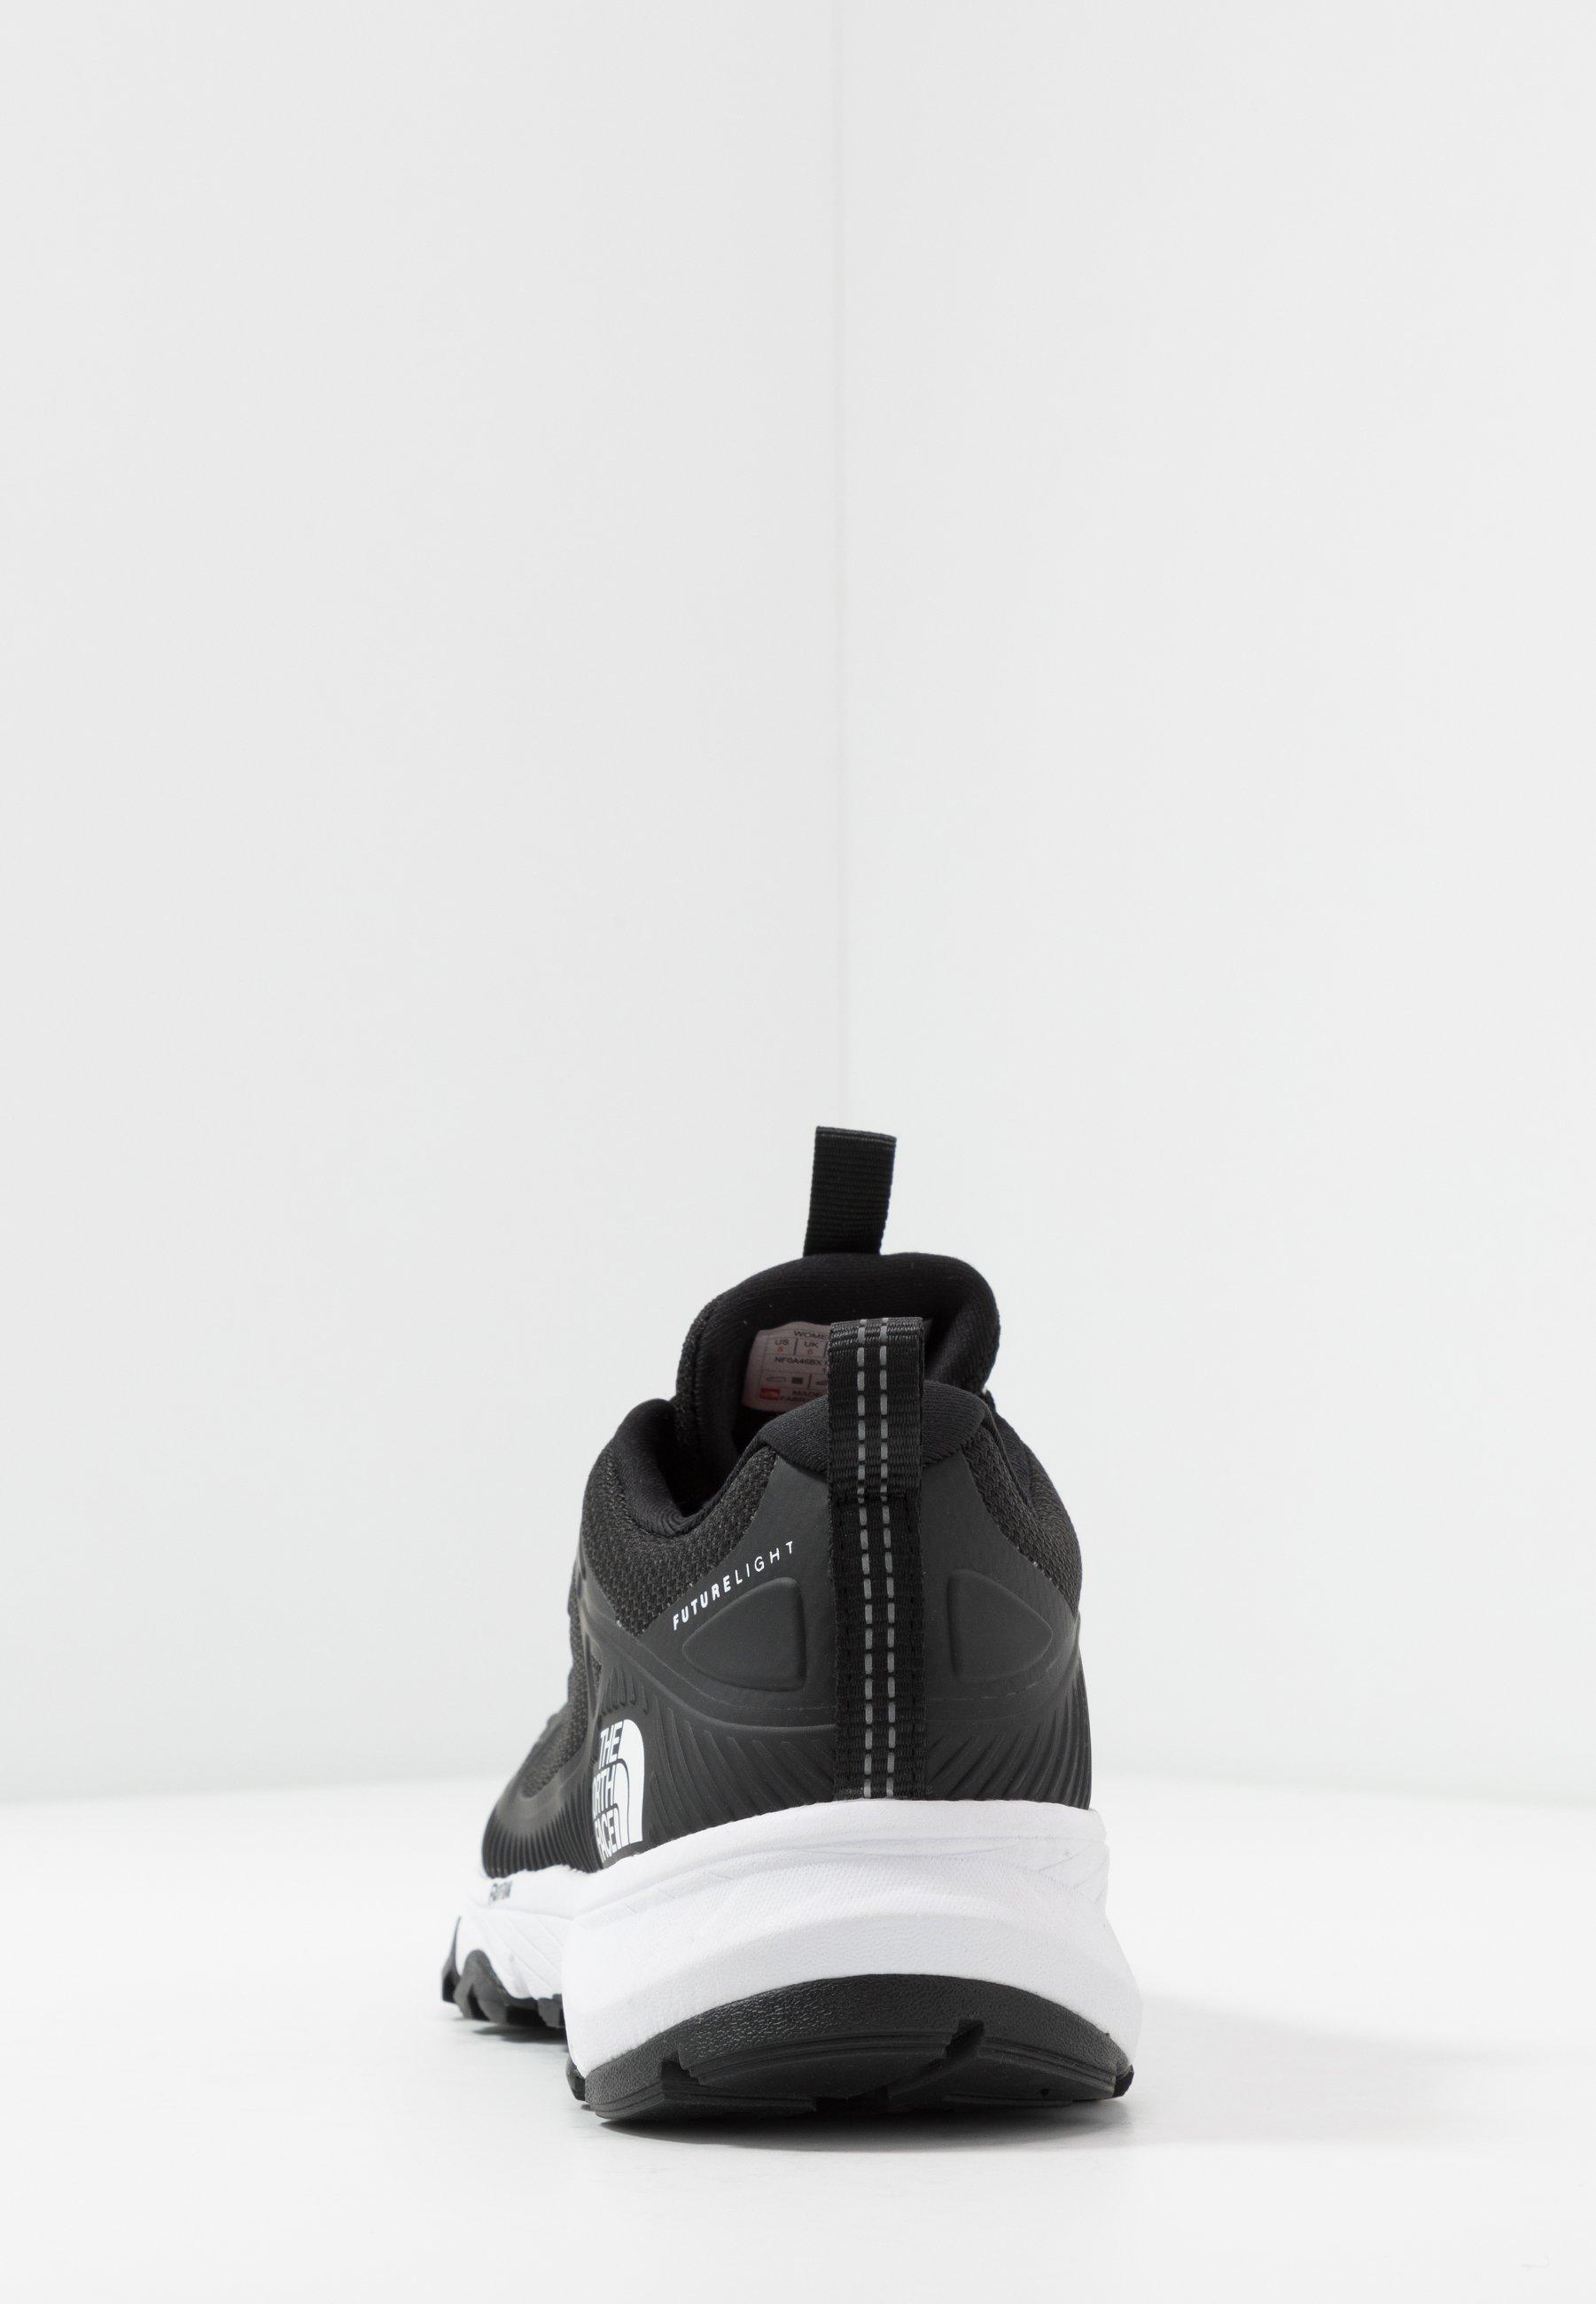 The North Face Women's Ultra Fastpack Iv Futurelight - Hikingsko Black/white